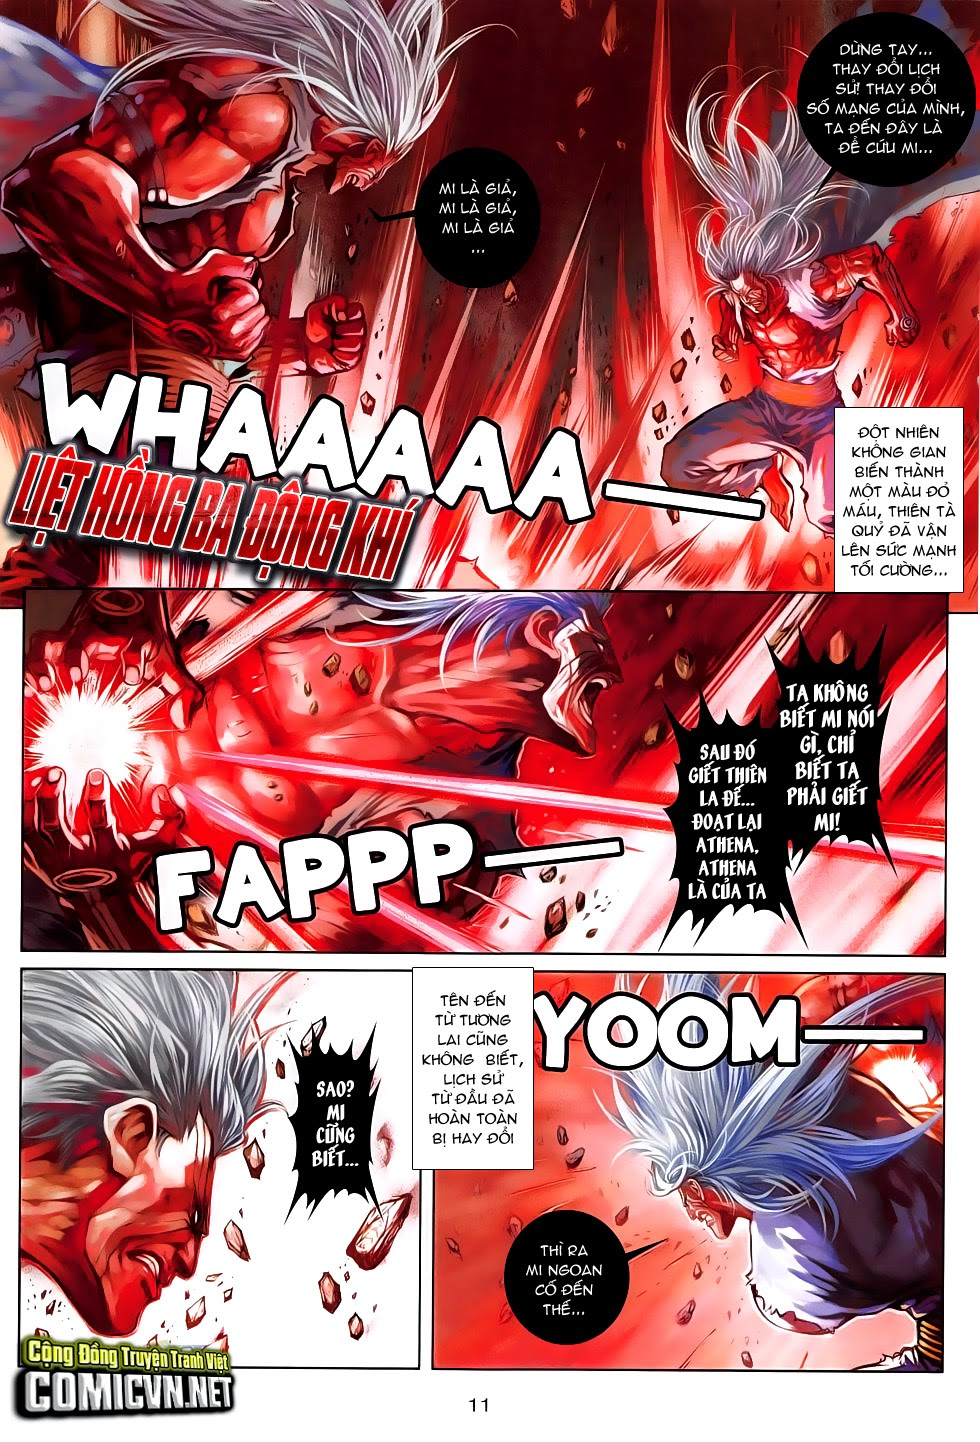 Ba Động Quyền Z Hadouken Zero chap 15 - Trang 11